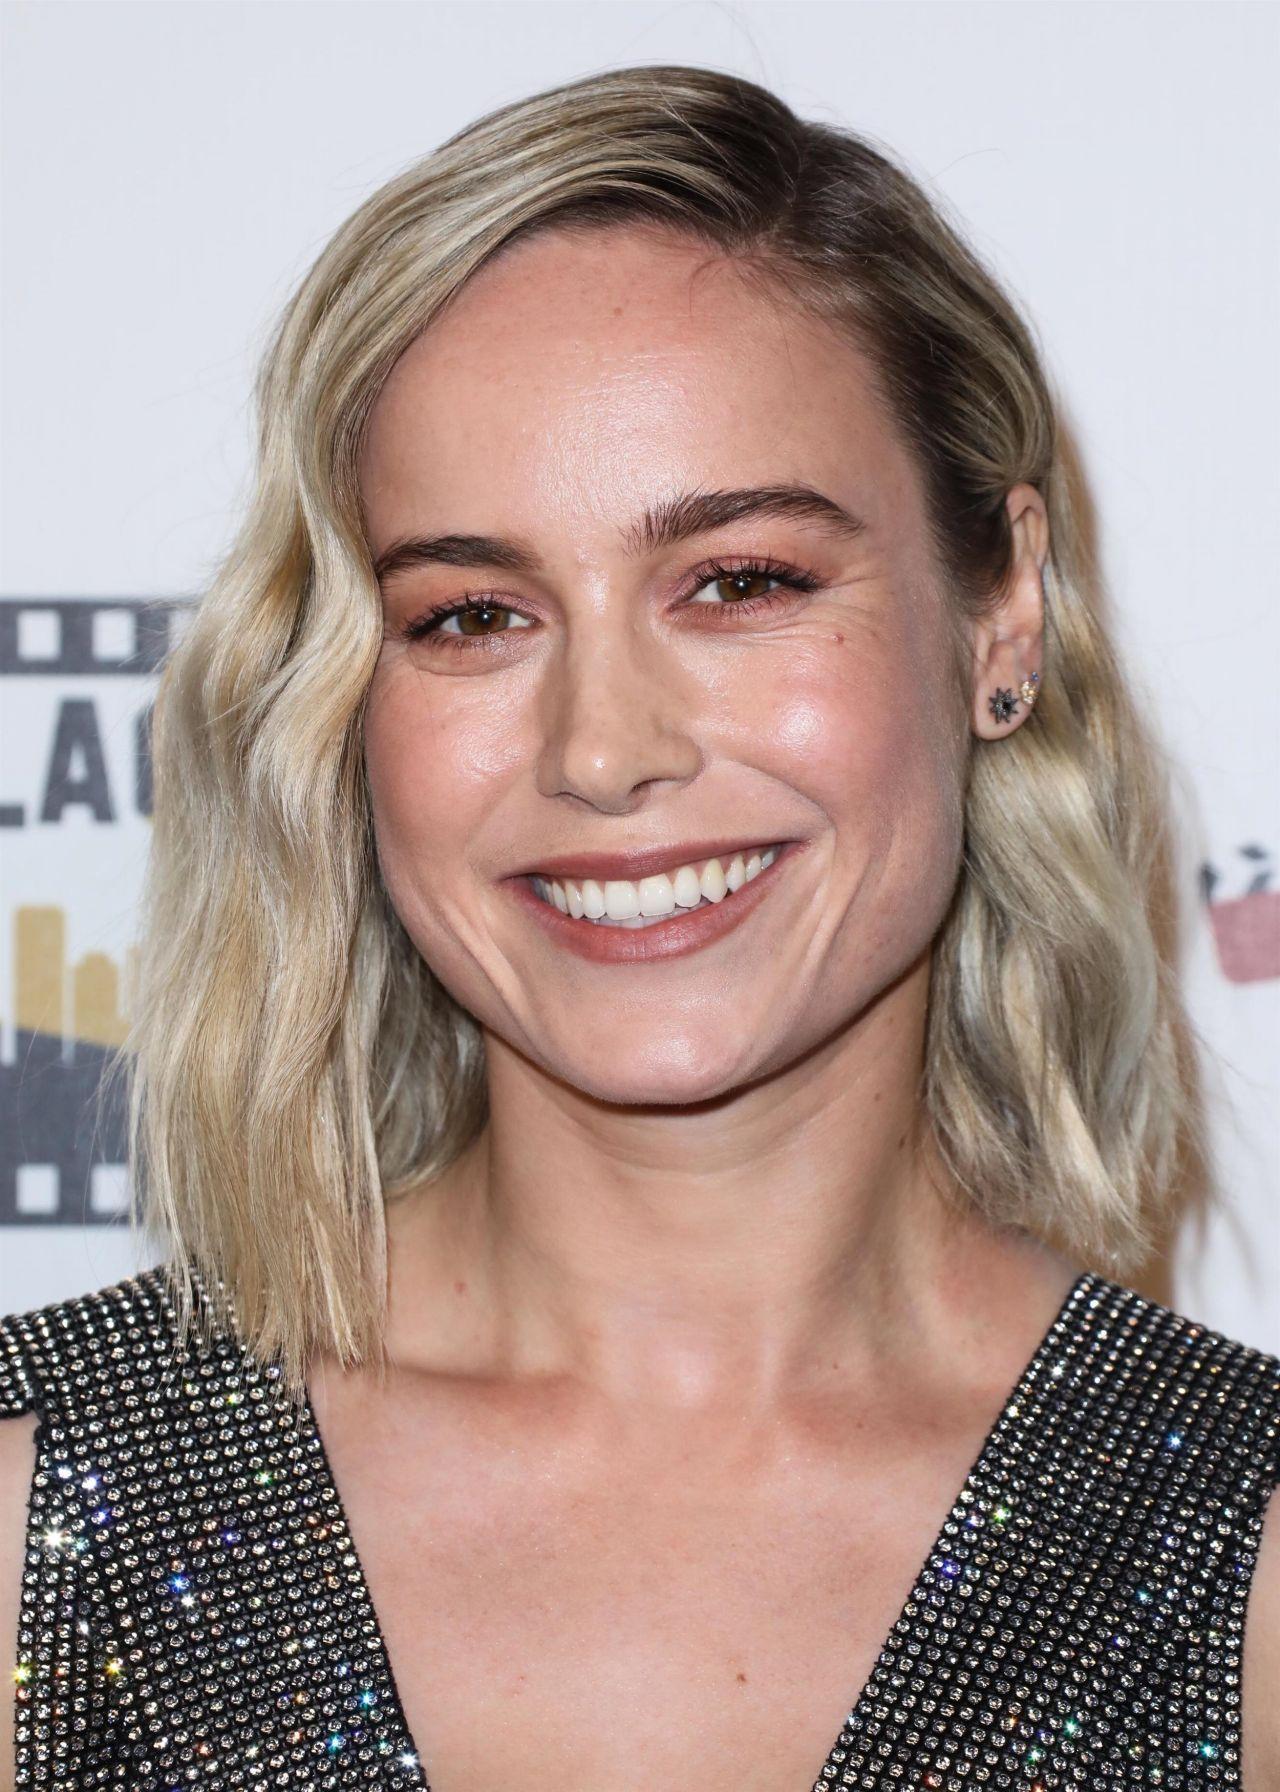 Image Result For Brie Larson 2019 Hair Brie Larson Brie Captain Marvel